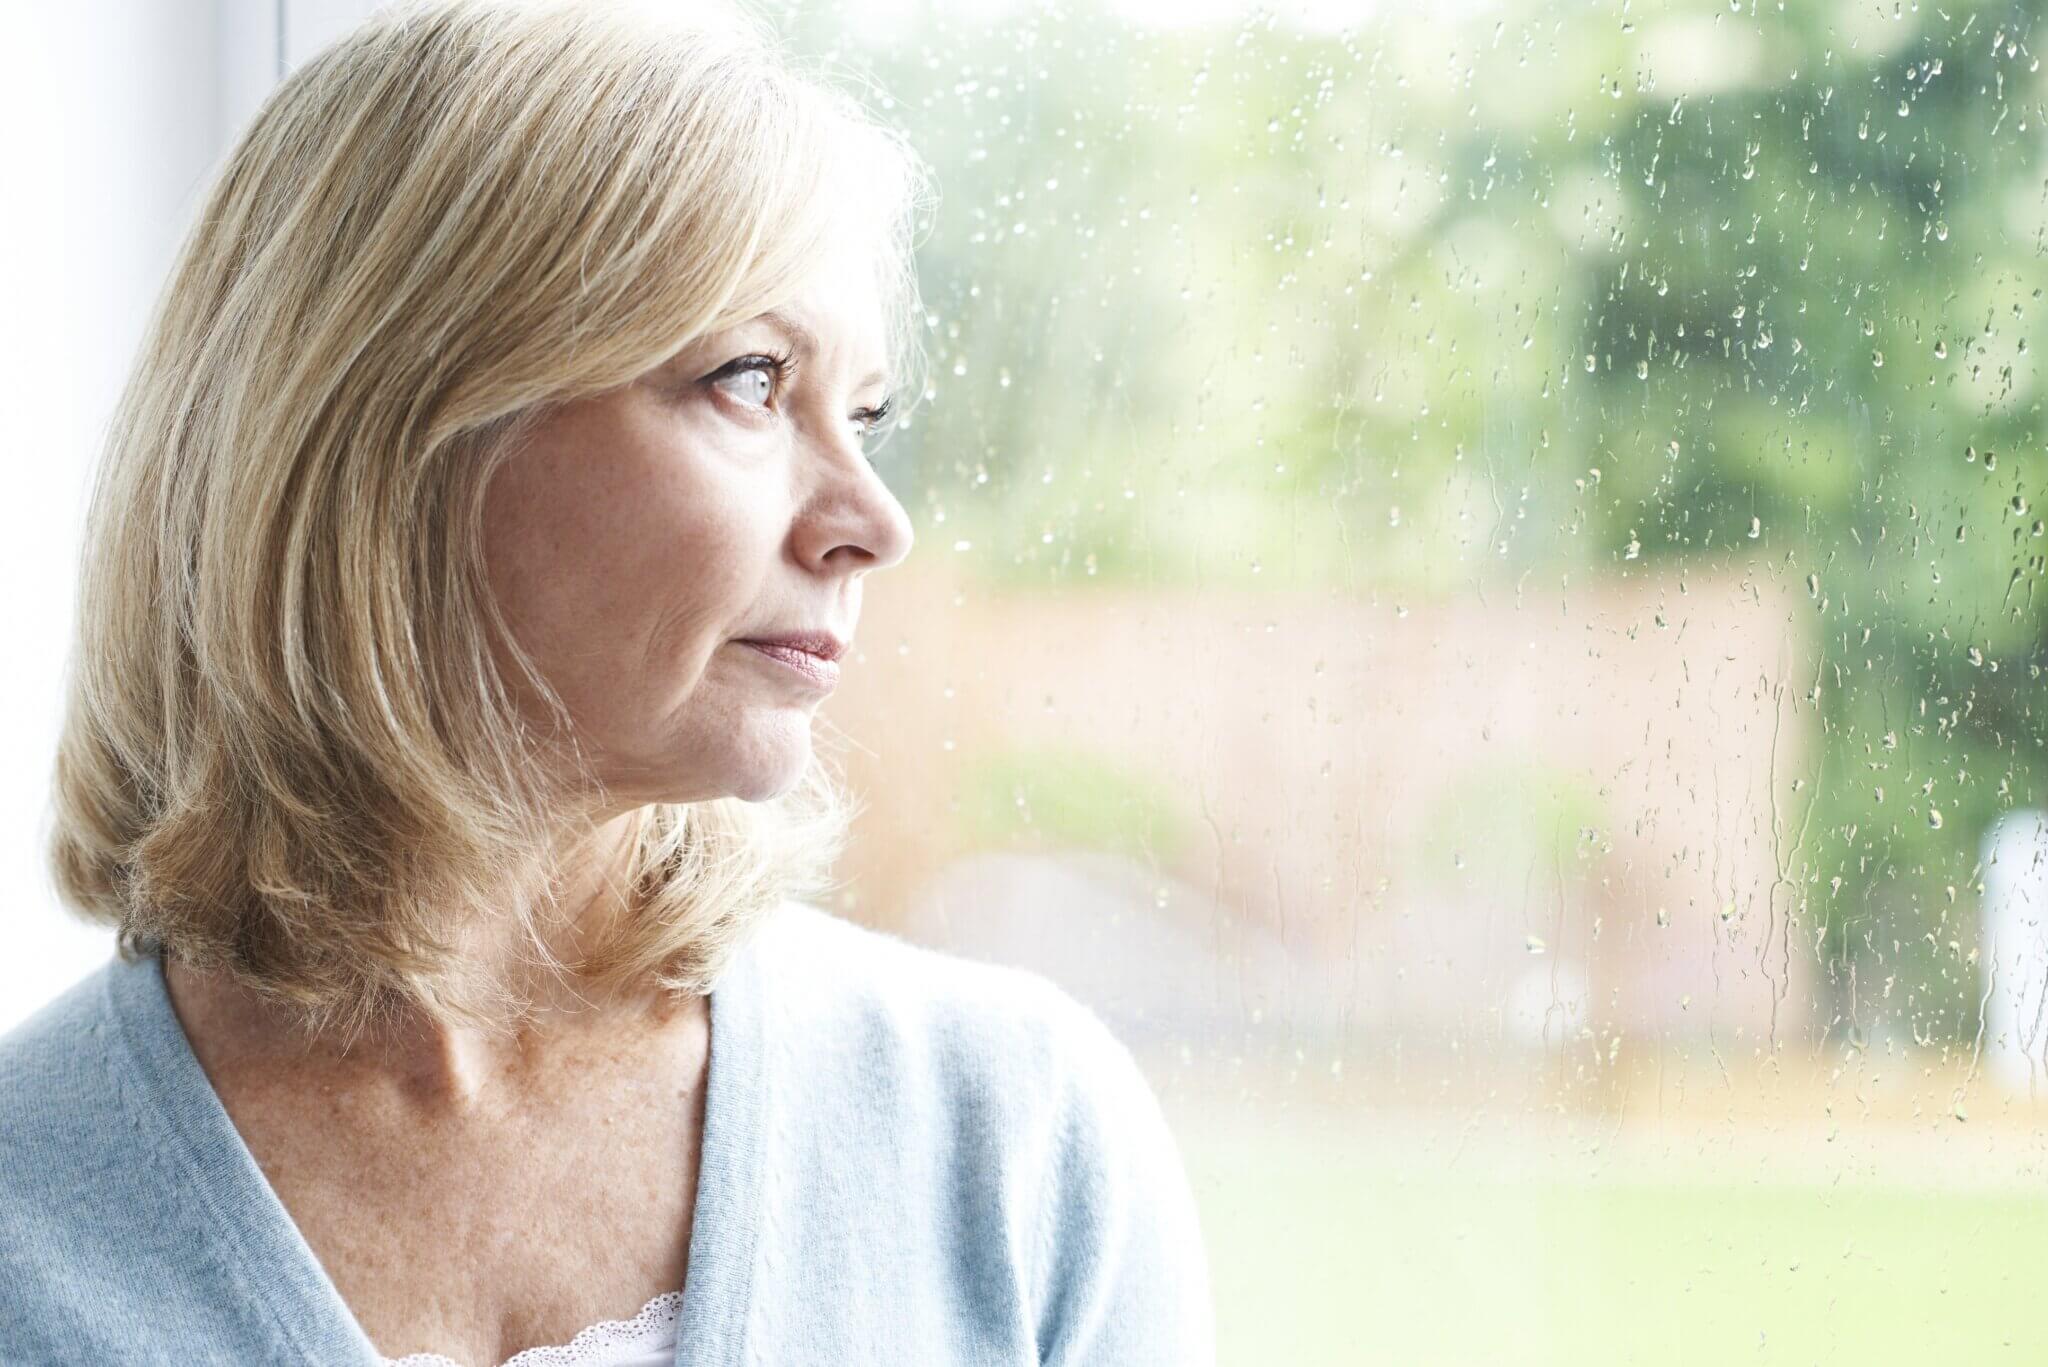 En interessant studie viser at fortvilelse forsvinner med alderen.